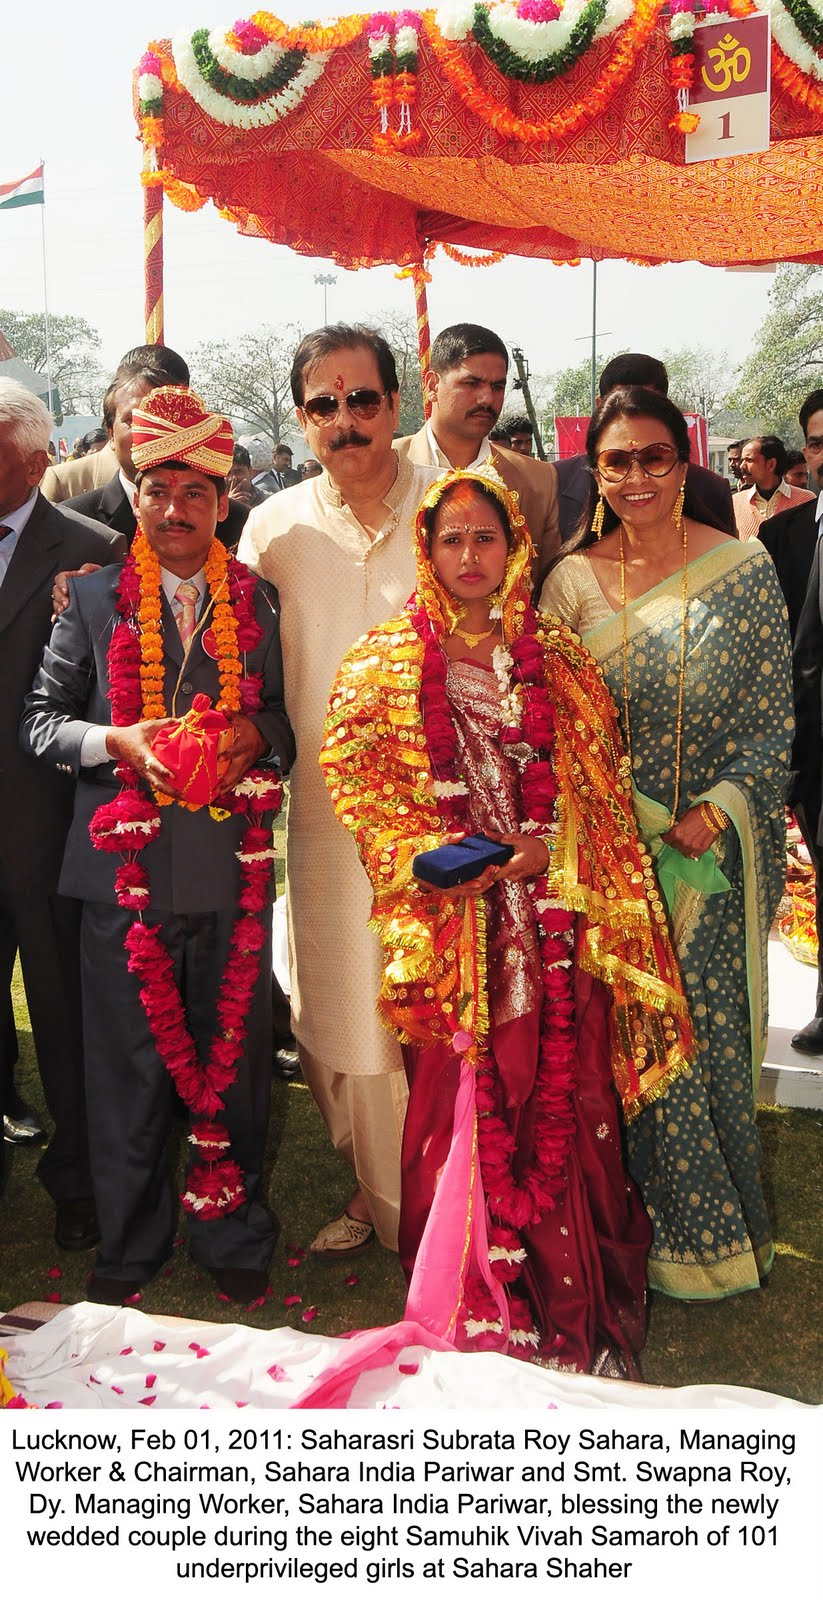 Malu hindu dating christian